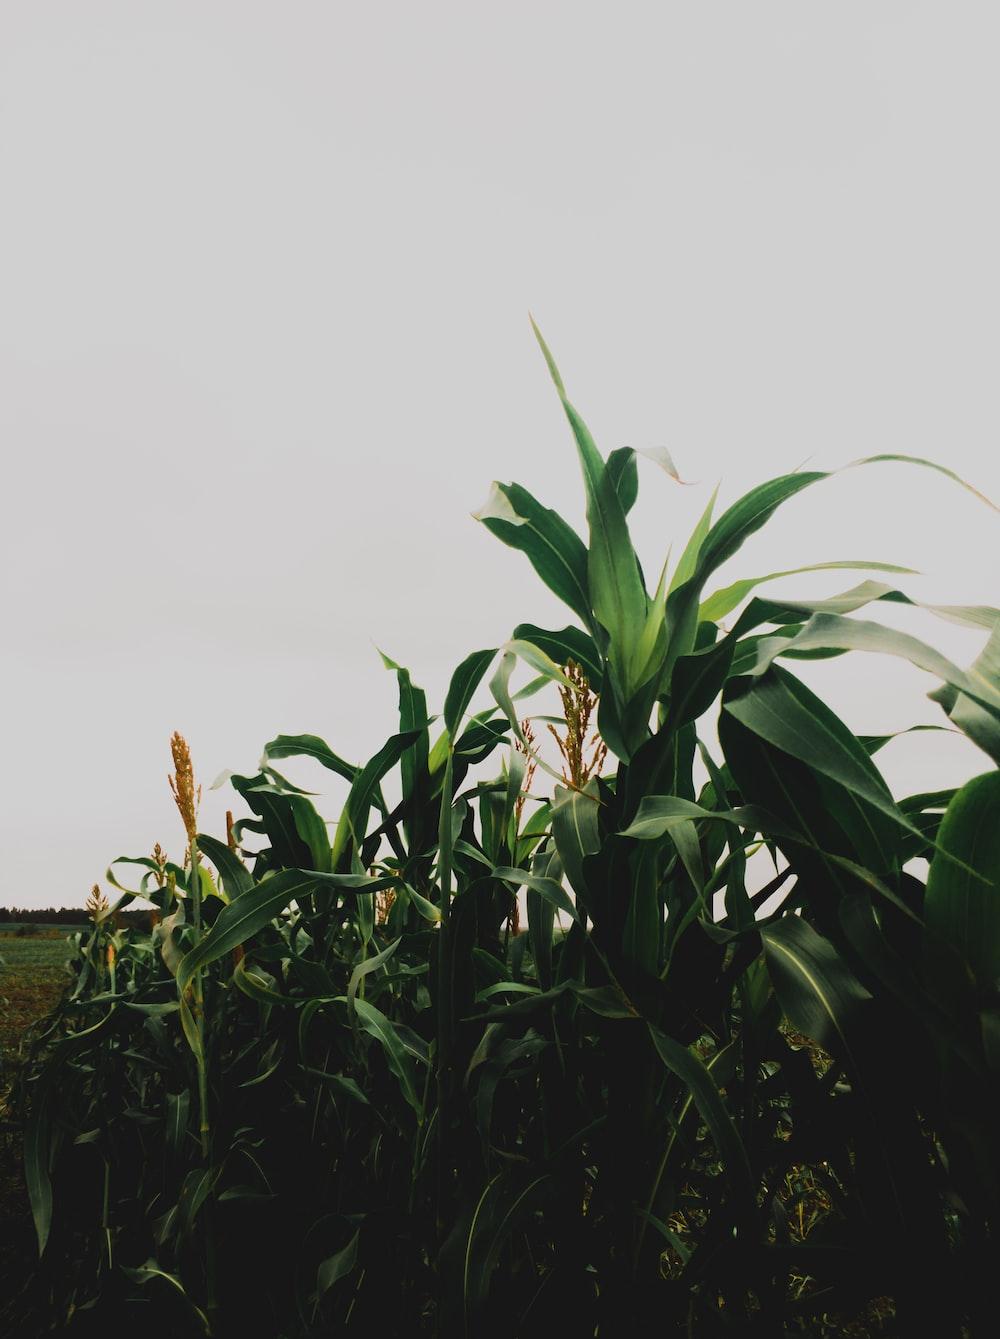 green corn field under white clouds during daytime